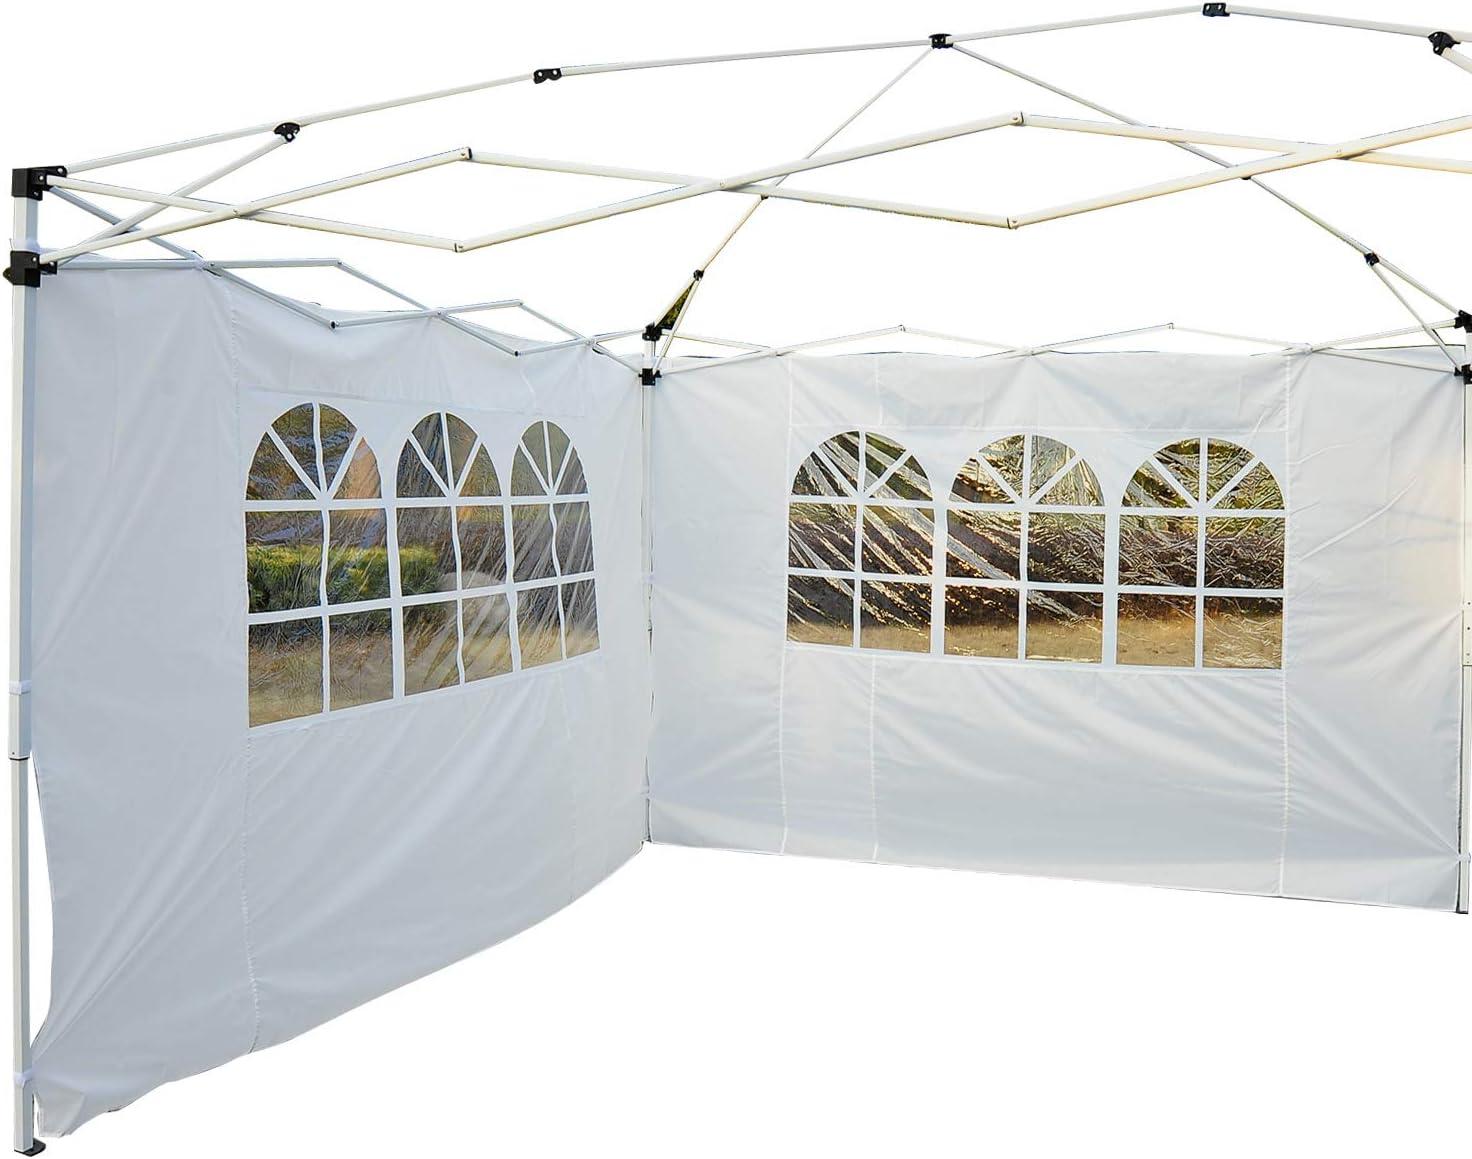 Outsunny 2 Paredes Parte Laterales para Carpa 3x2 Lado Parasol de Gazebo Tela Oxford con Ventana Medidas Apto para 3x3 3x6 Blanco: Amazon.es: Jardín